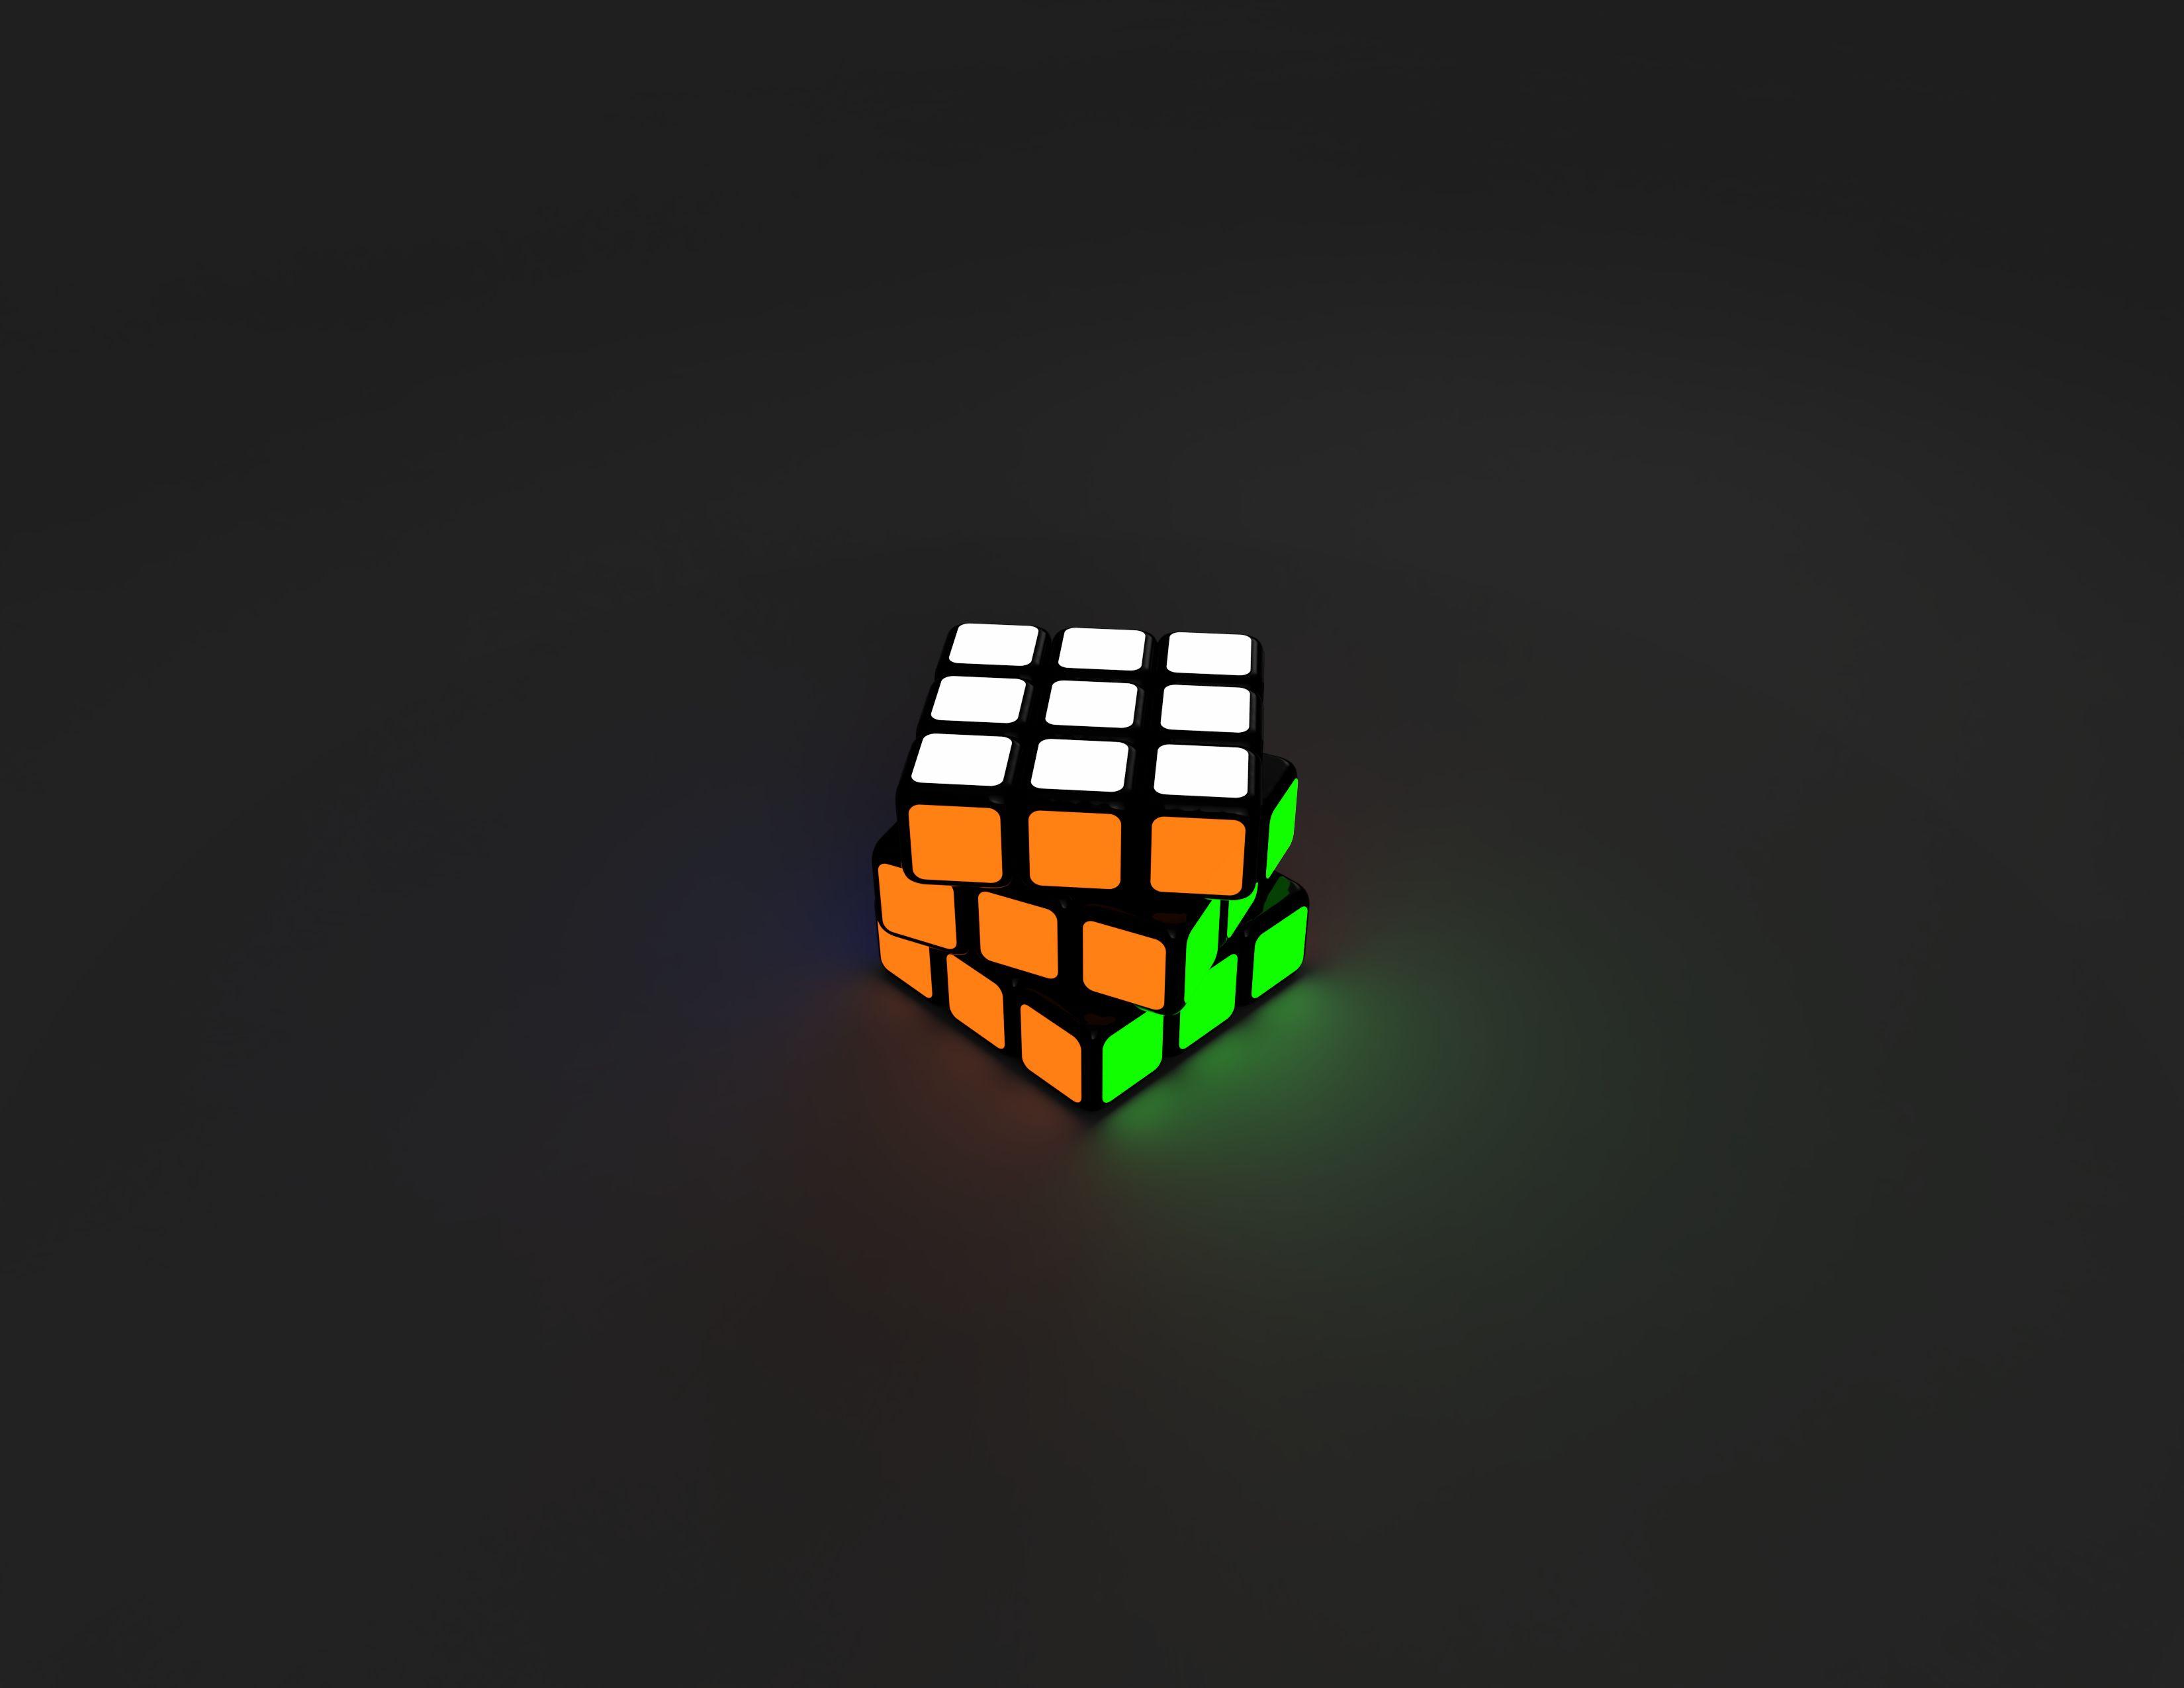 2-3500-3500